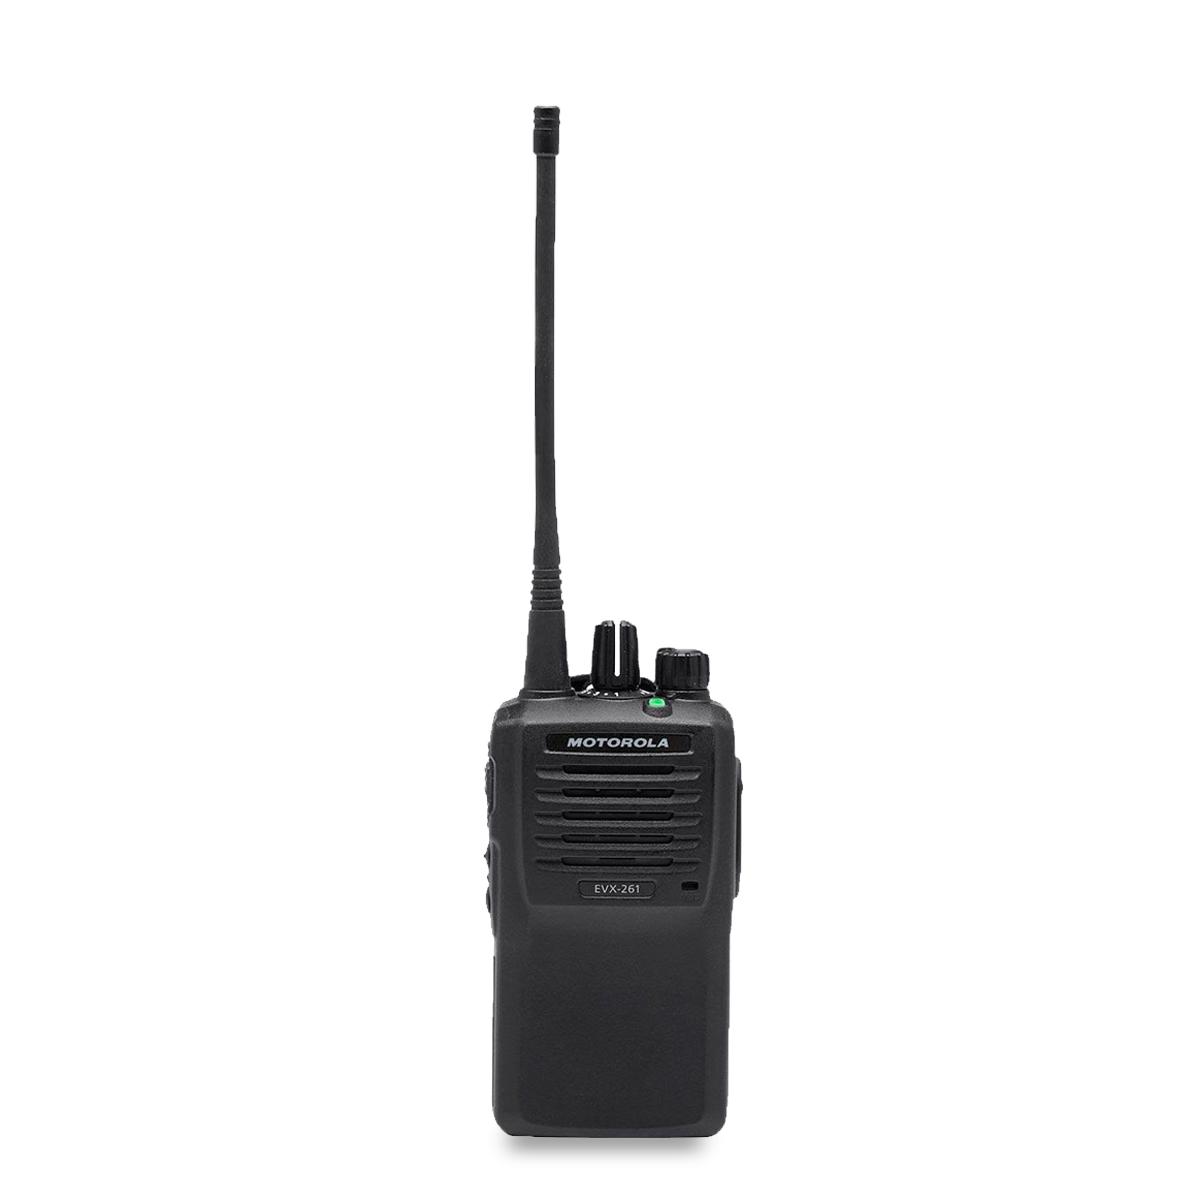 Radio Motorola EVX-261 Digital EVX-261-D0 VHF 136-174 MHz